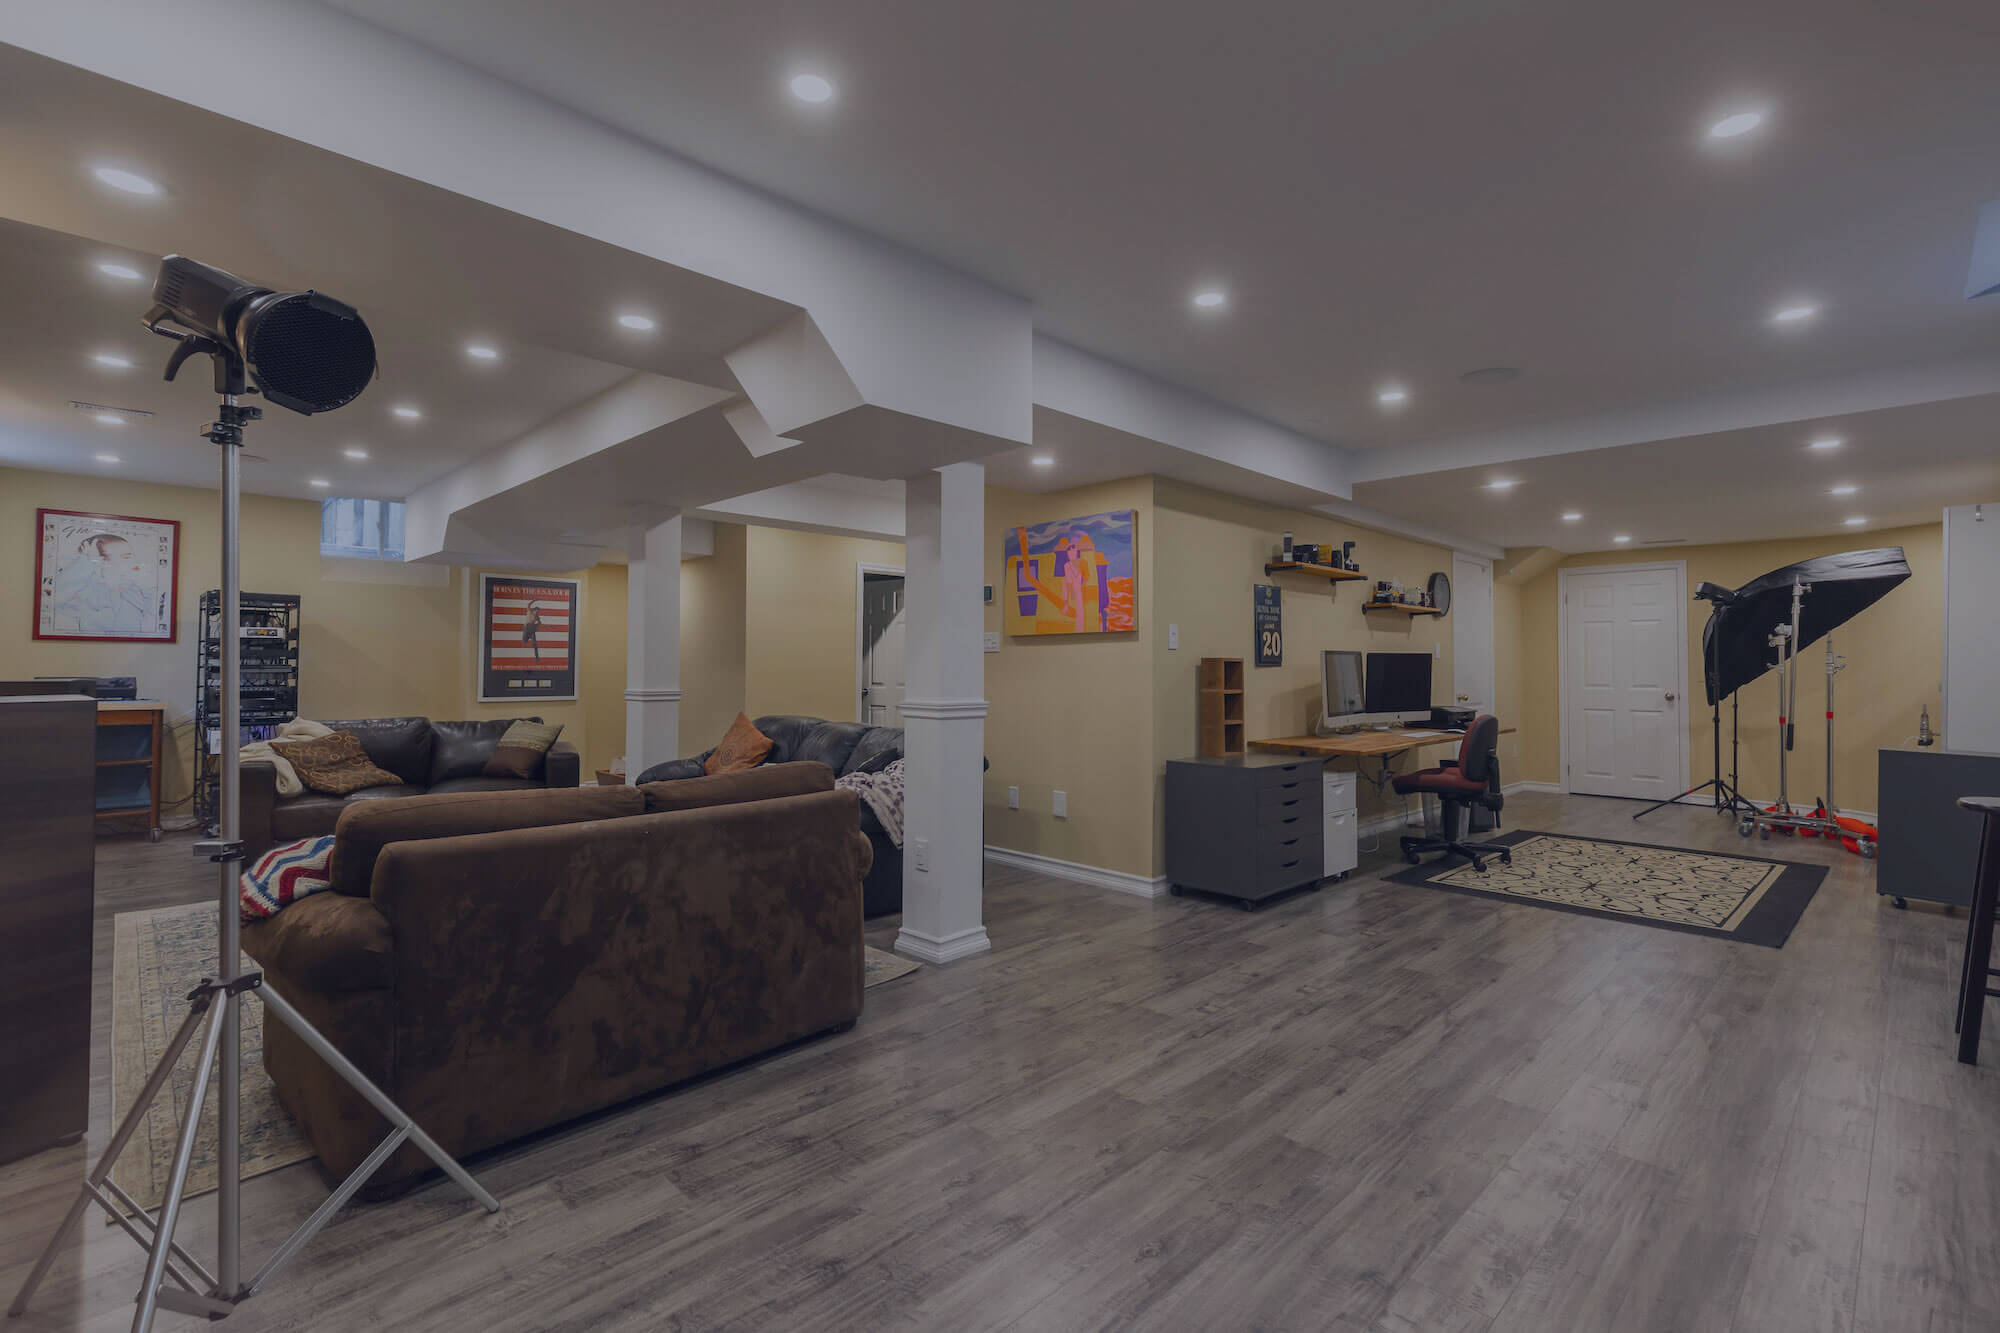 Basement Renovations Cost Average Per Square Foot In Toronto Canada